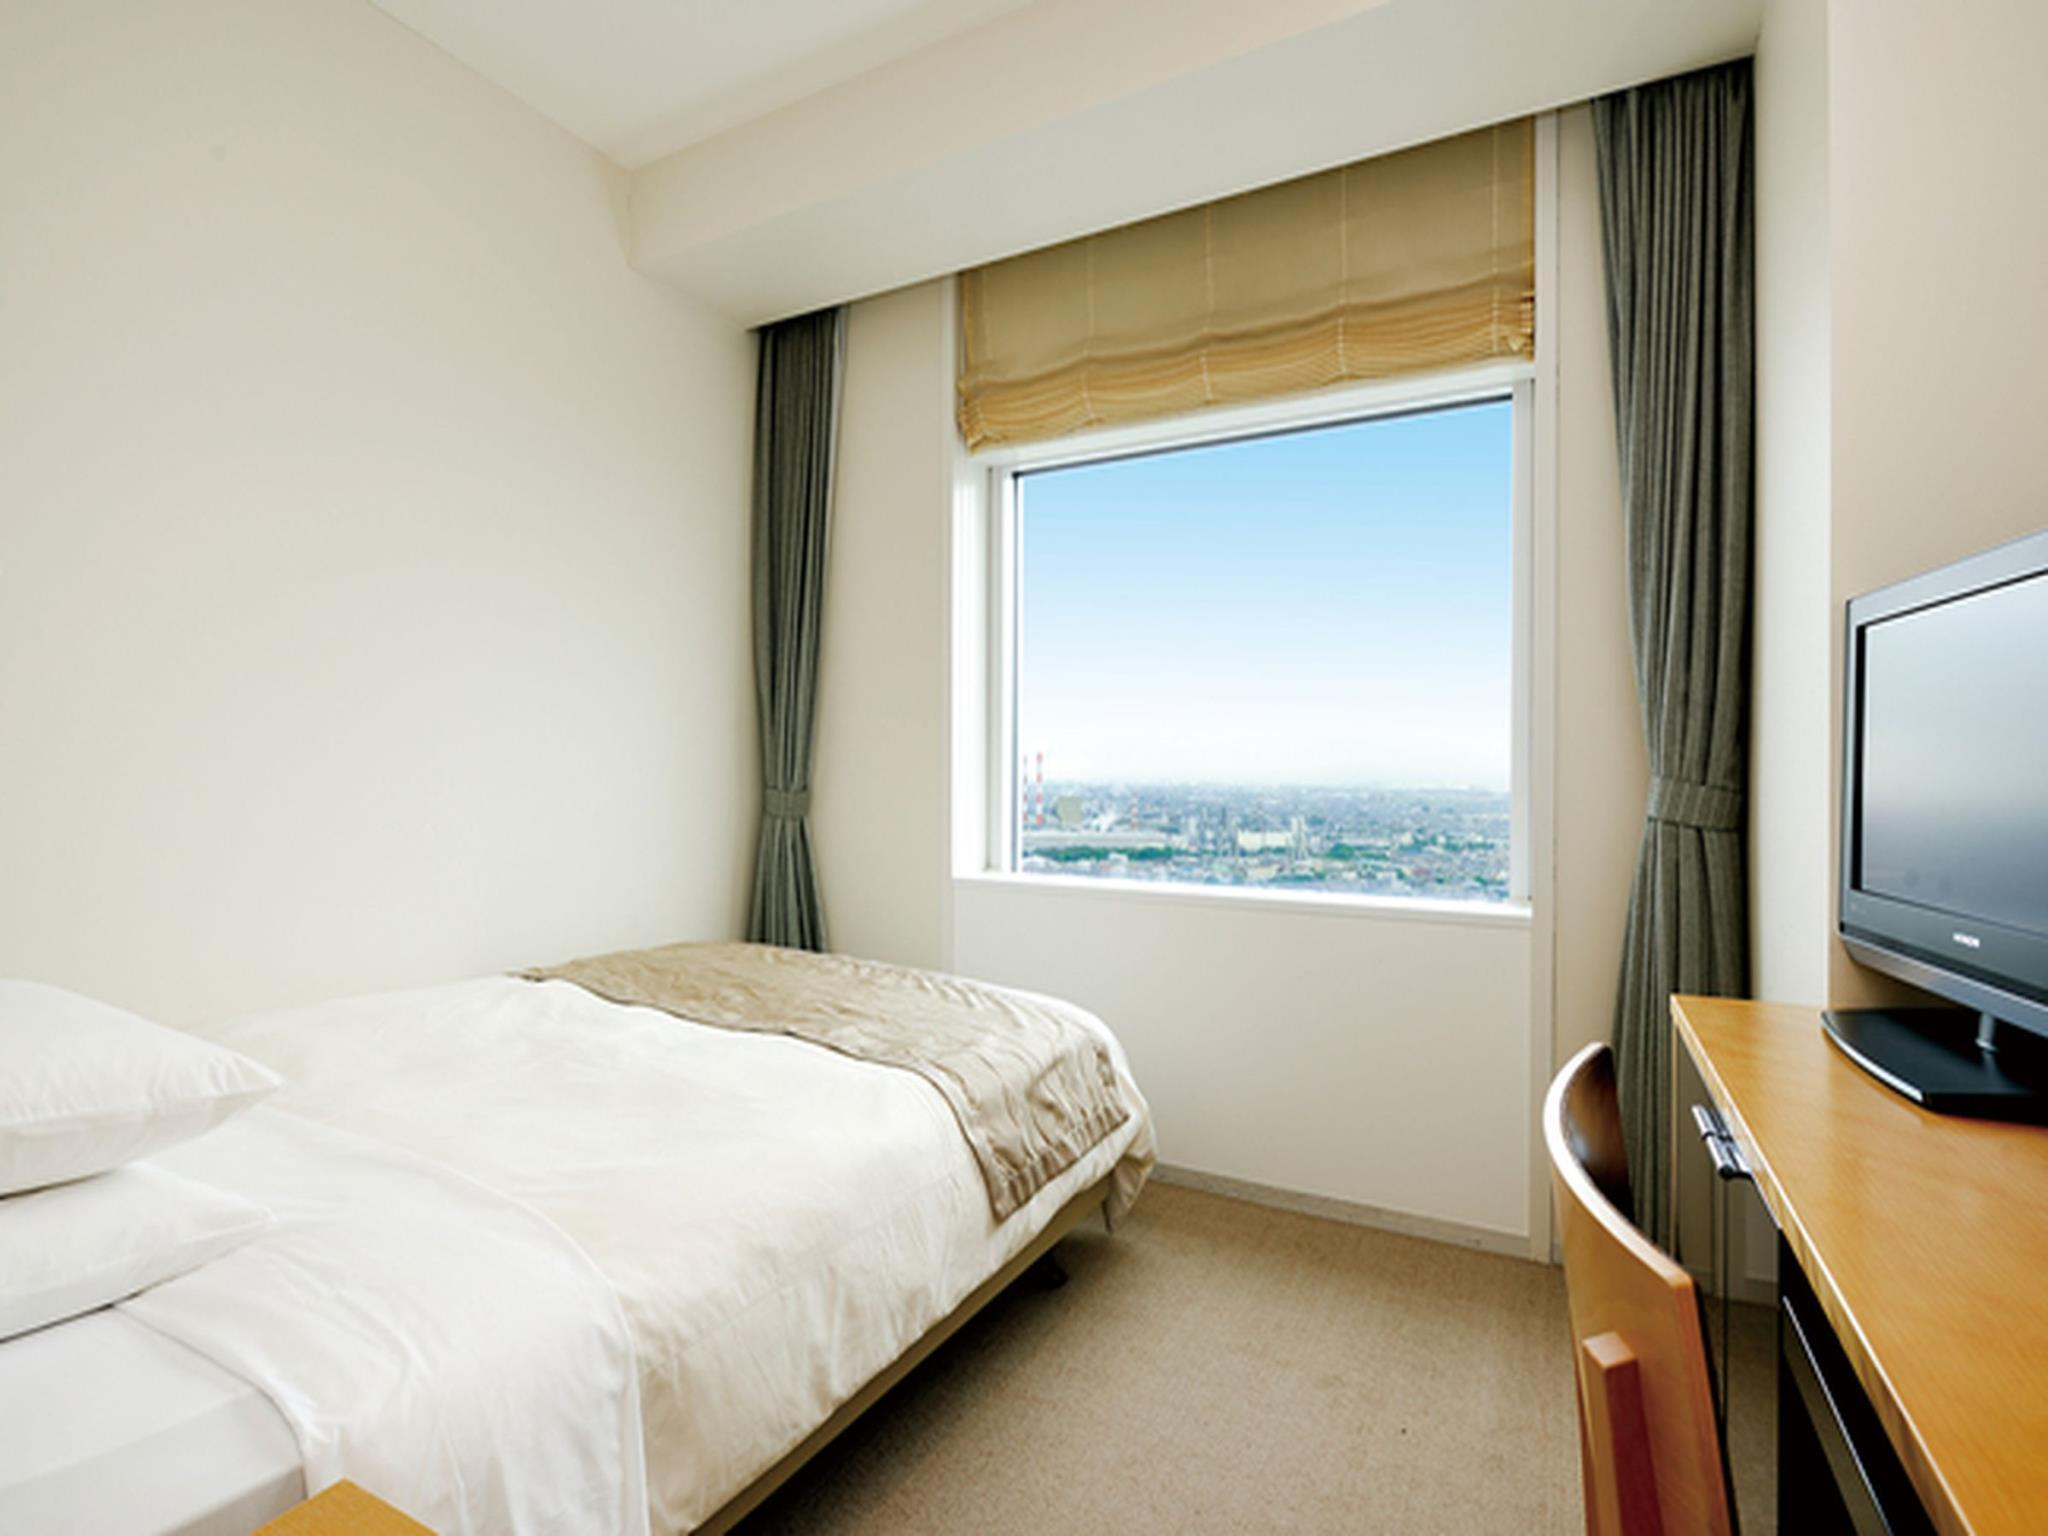 Hotel Nikko Niigata, Niigata